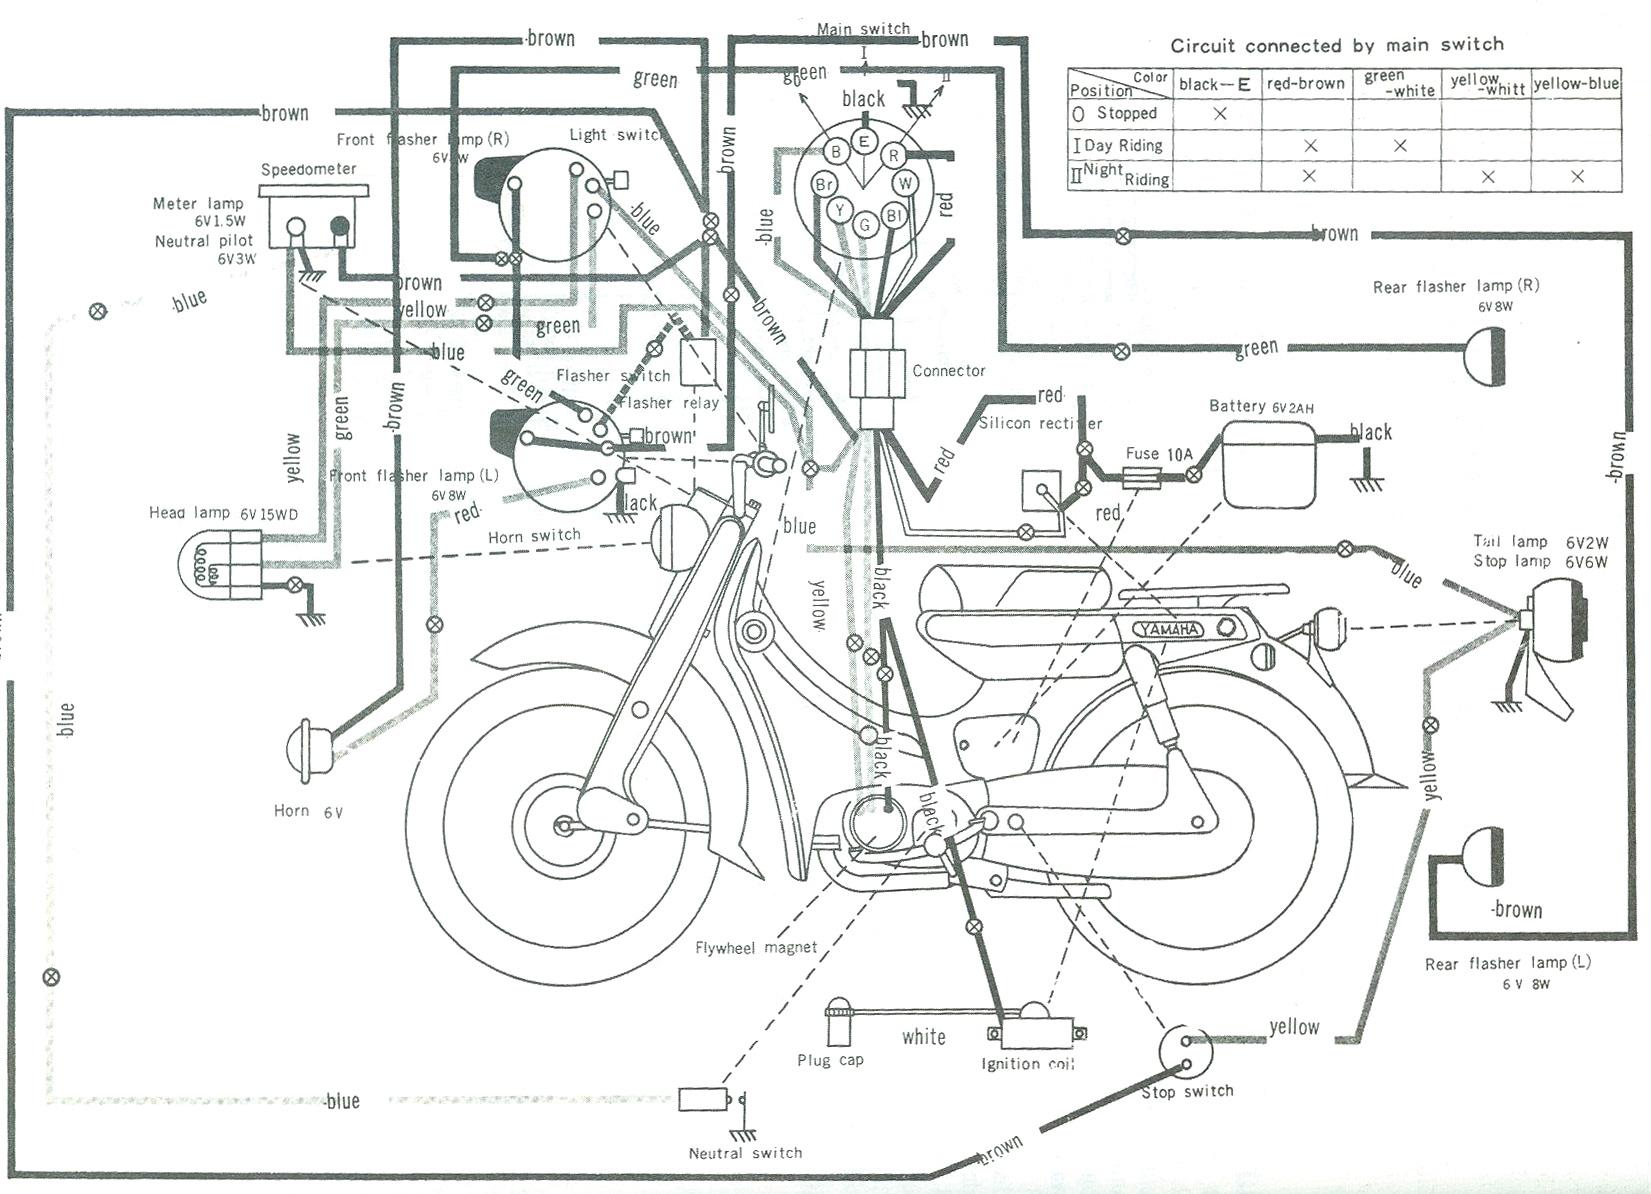 Руководство по ремонту мопеда Suzuki RV50 (в виде схемы)